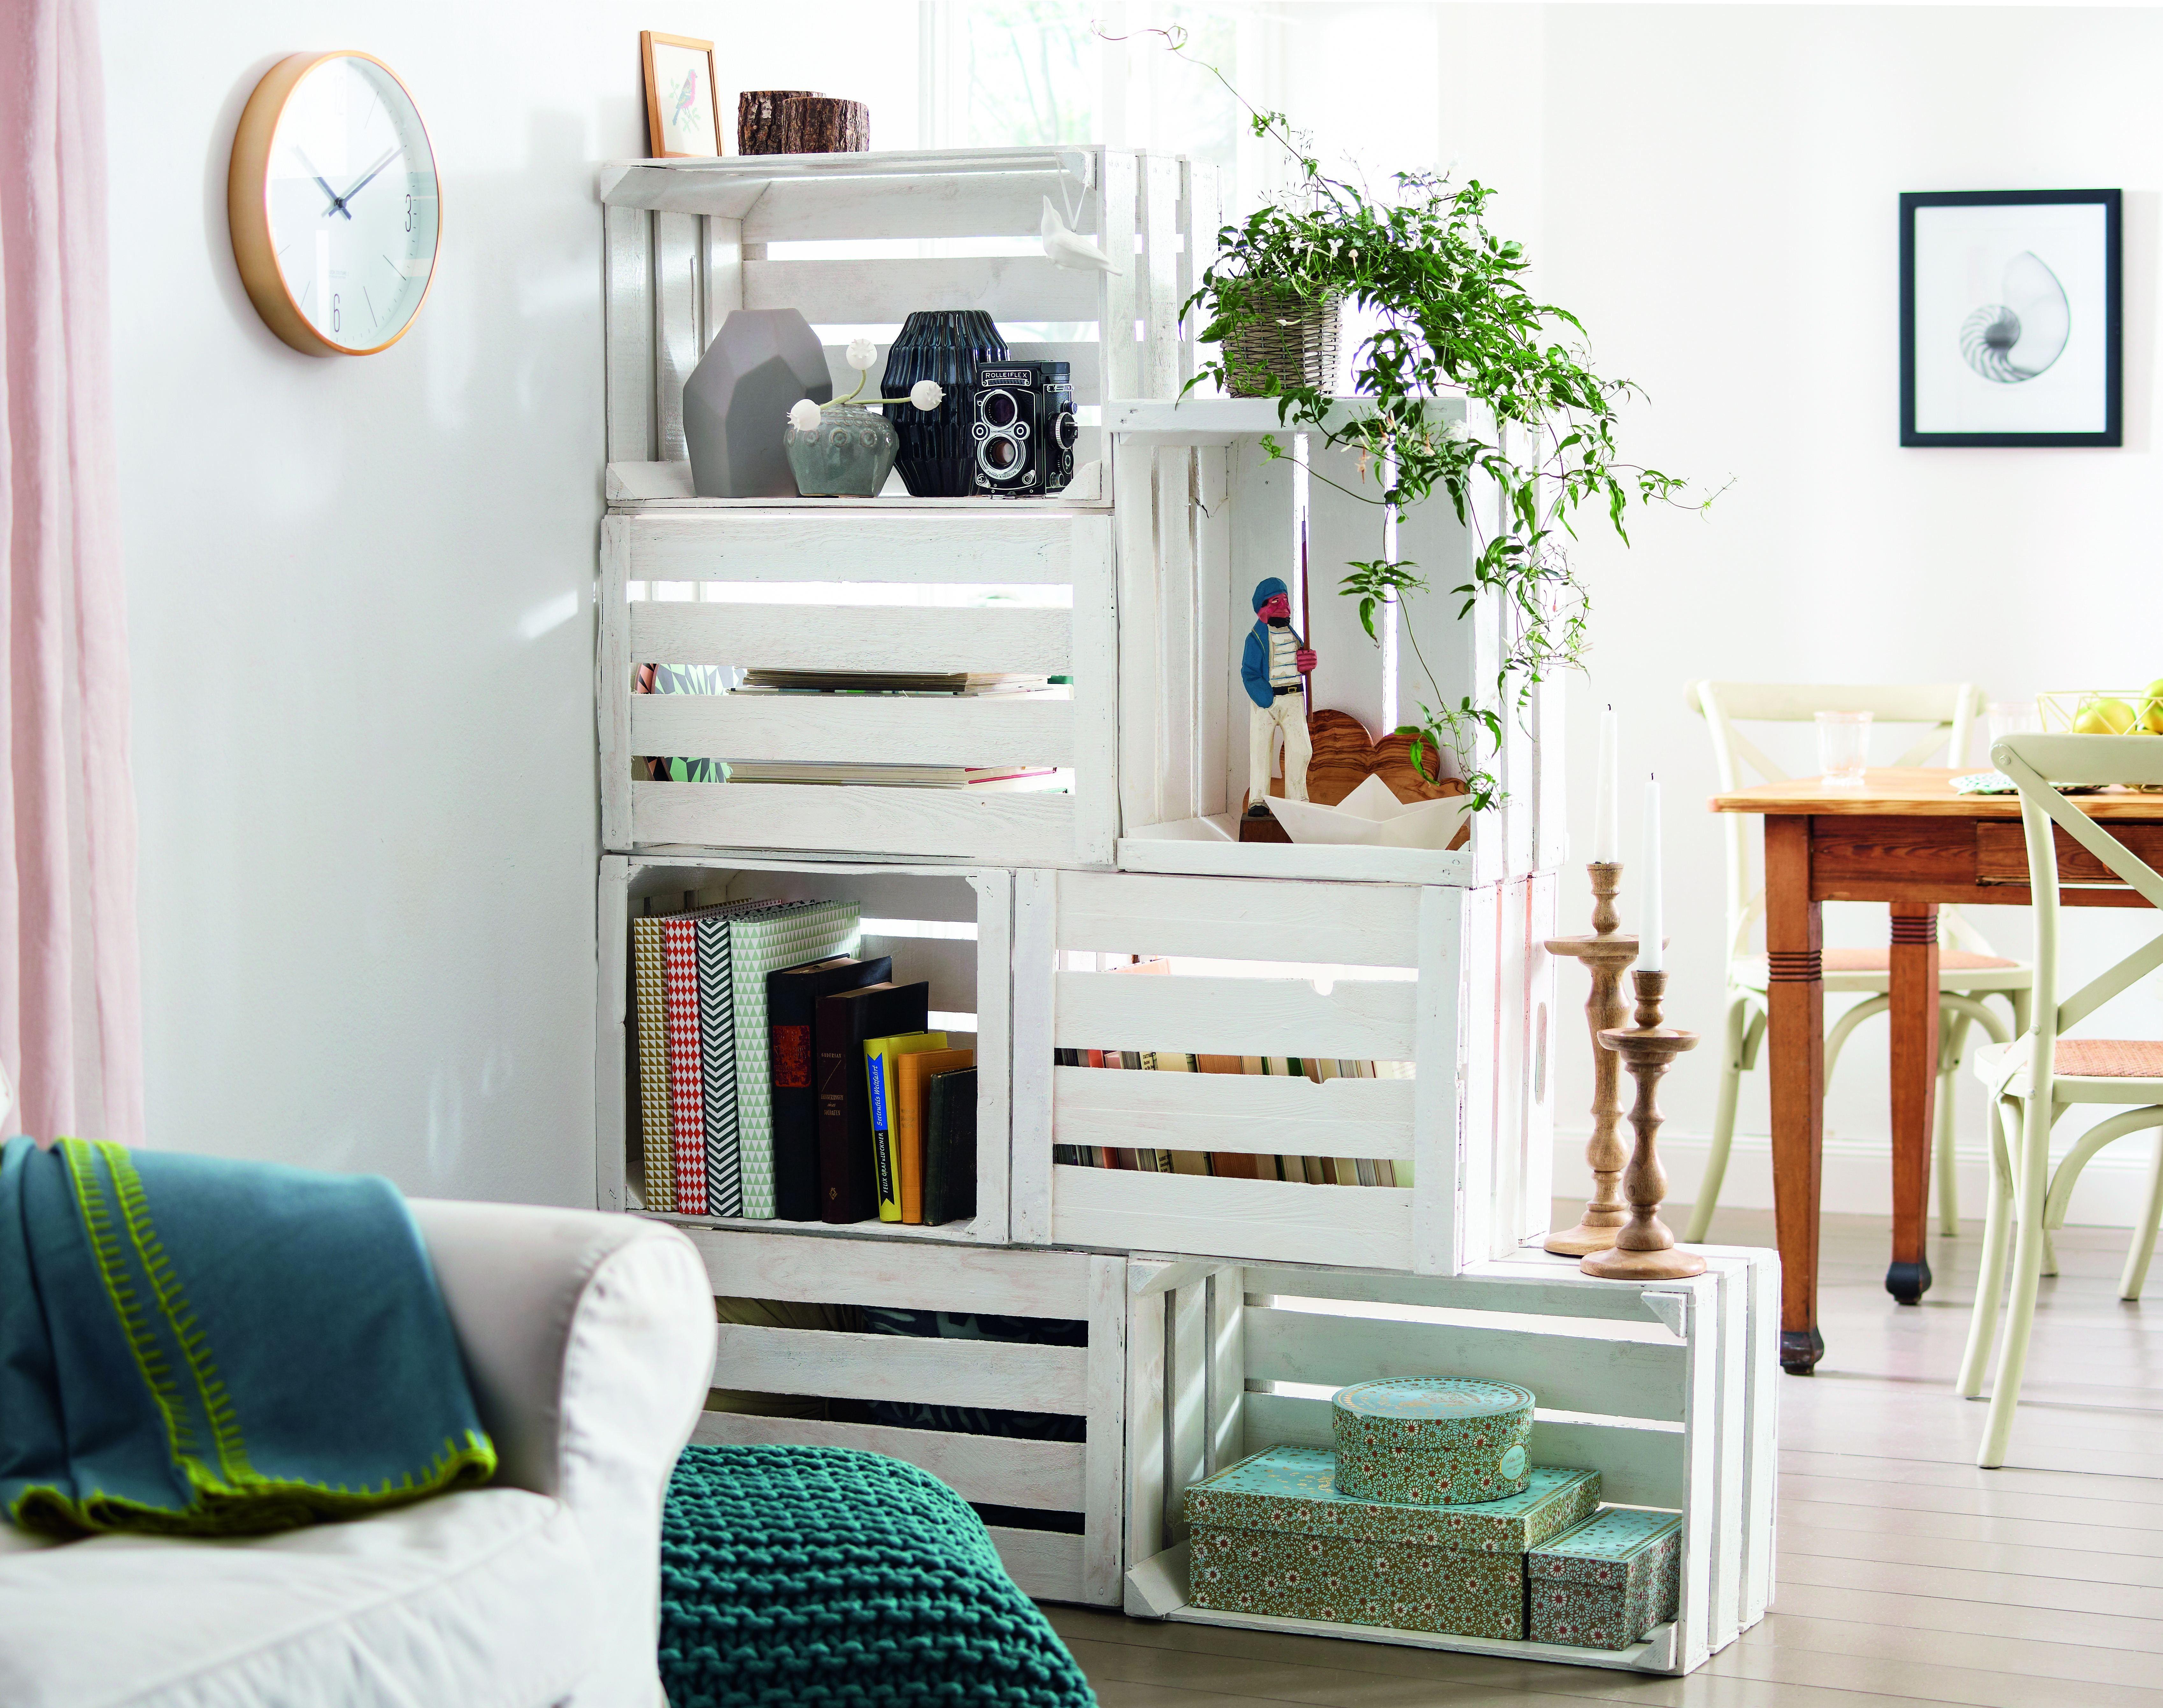 Diy room divider and shelf ideas pinterest wooden crates